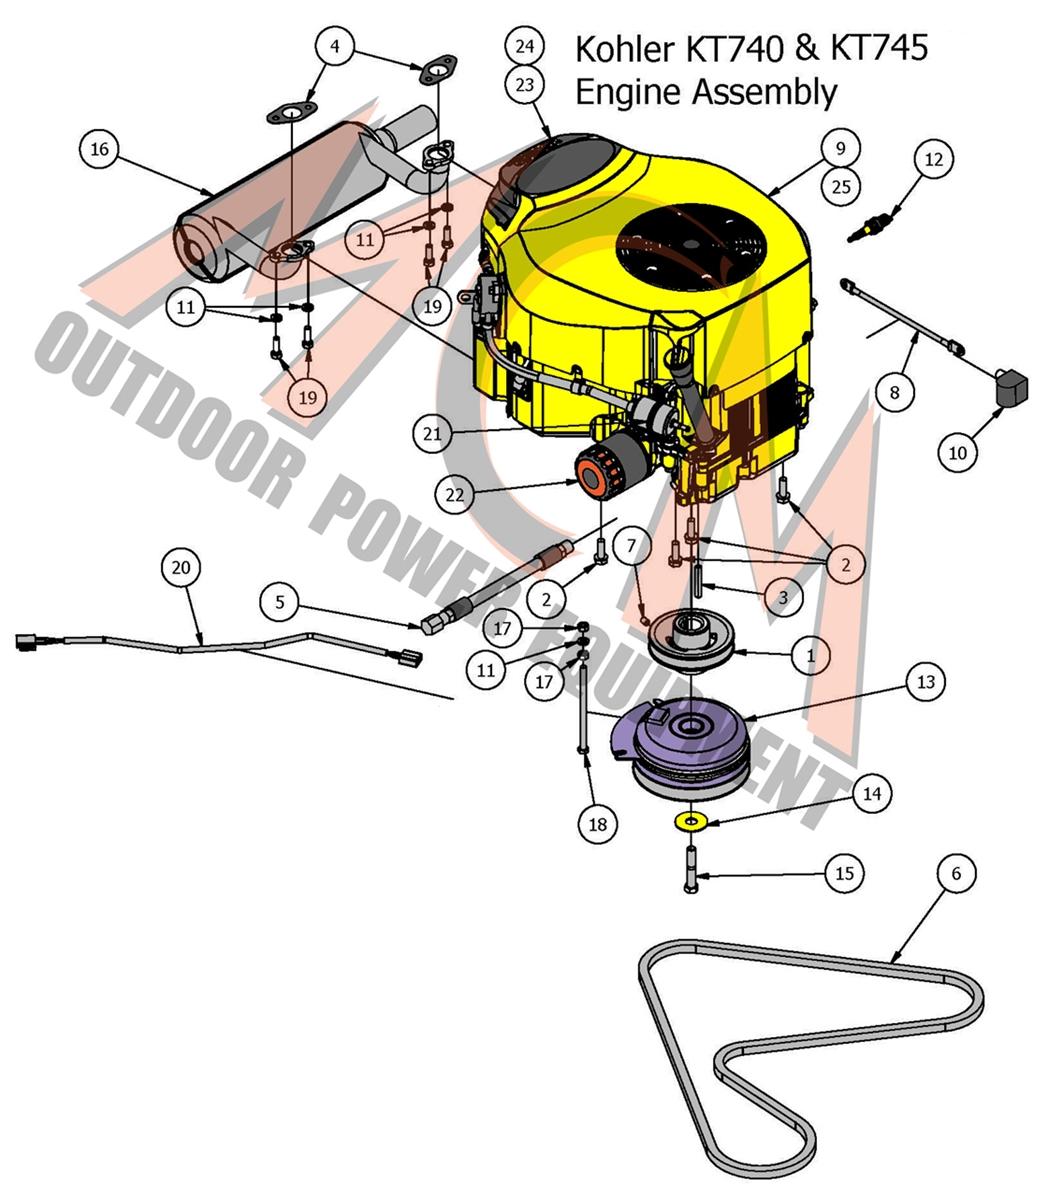 Bad Boy Mower Part, 2017 ZT ELITE KOHLER 740CC & 745CC ENGINE